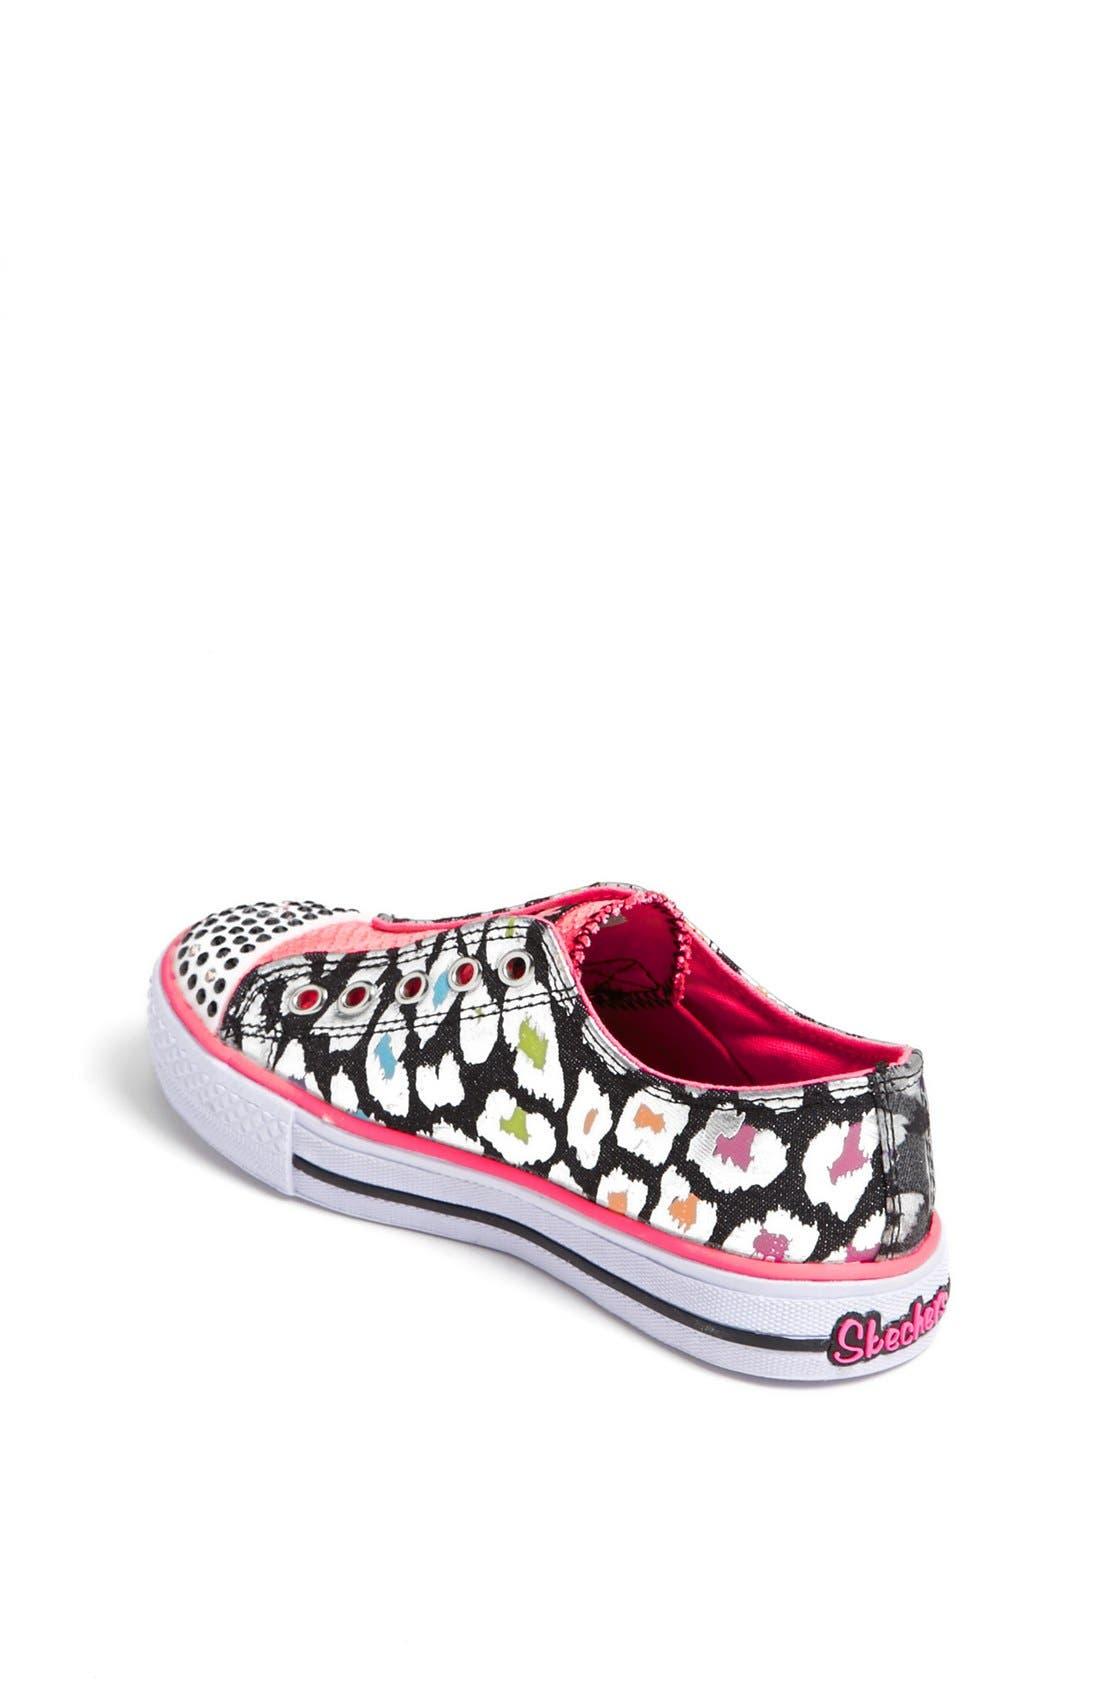 Alternate Image 2  - SKECHERS 'Twinkle Toes' Light-Up Sneaker (Toddler & Little Kid)